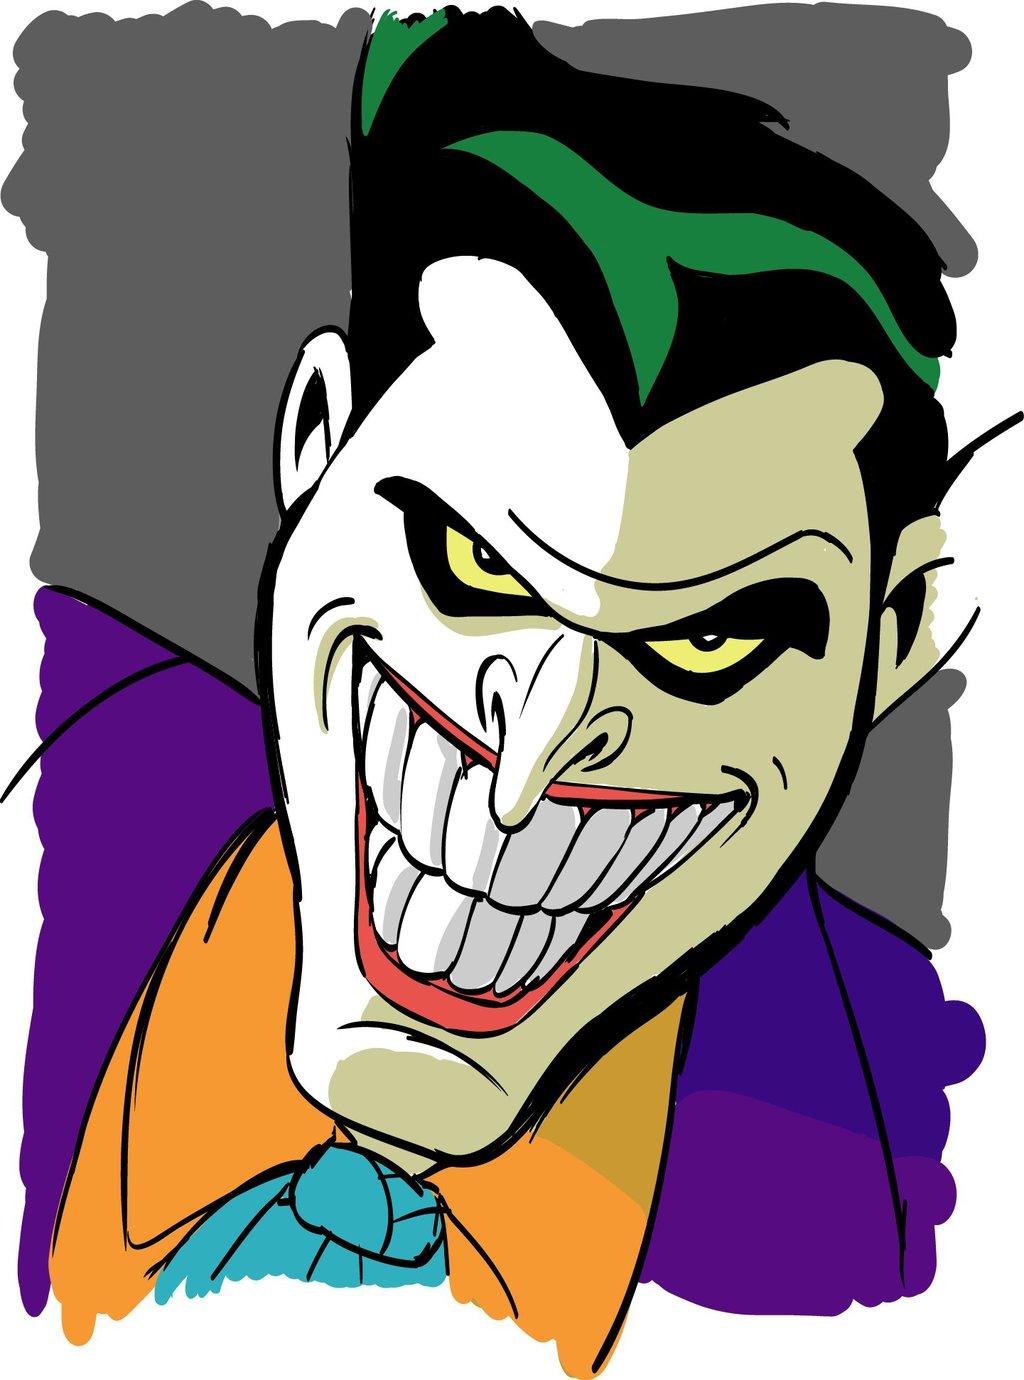 Joker clipart #4, Download drawings